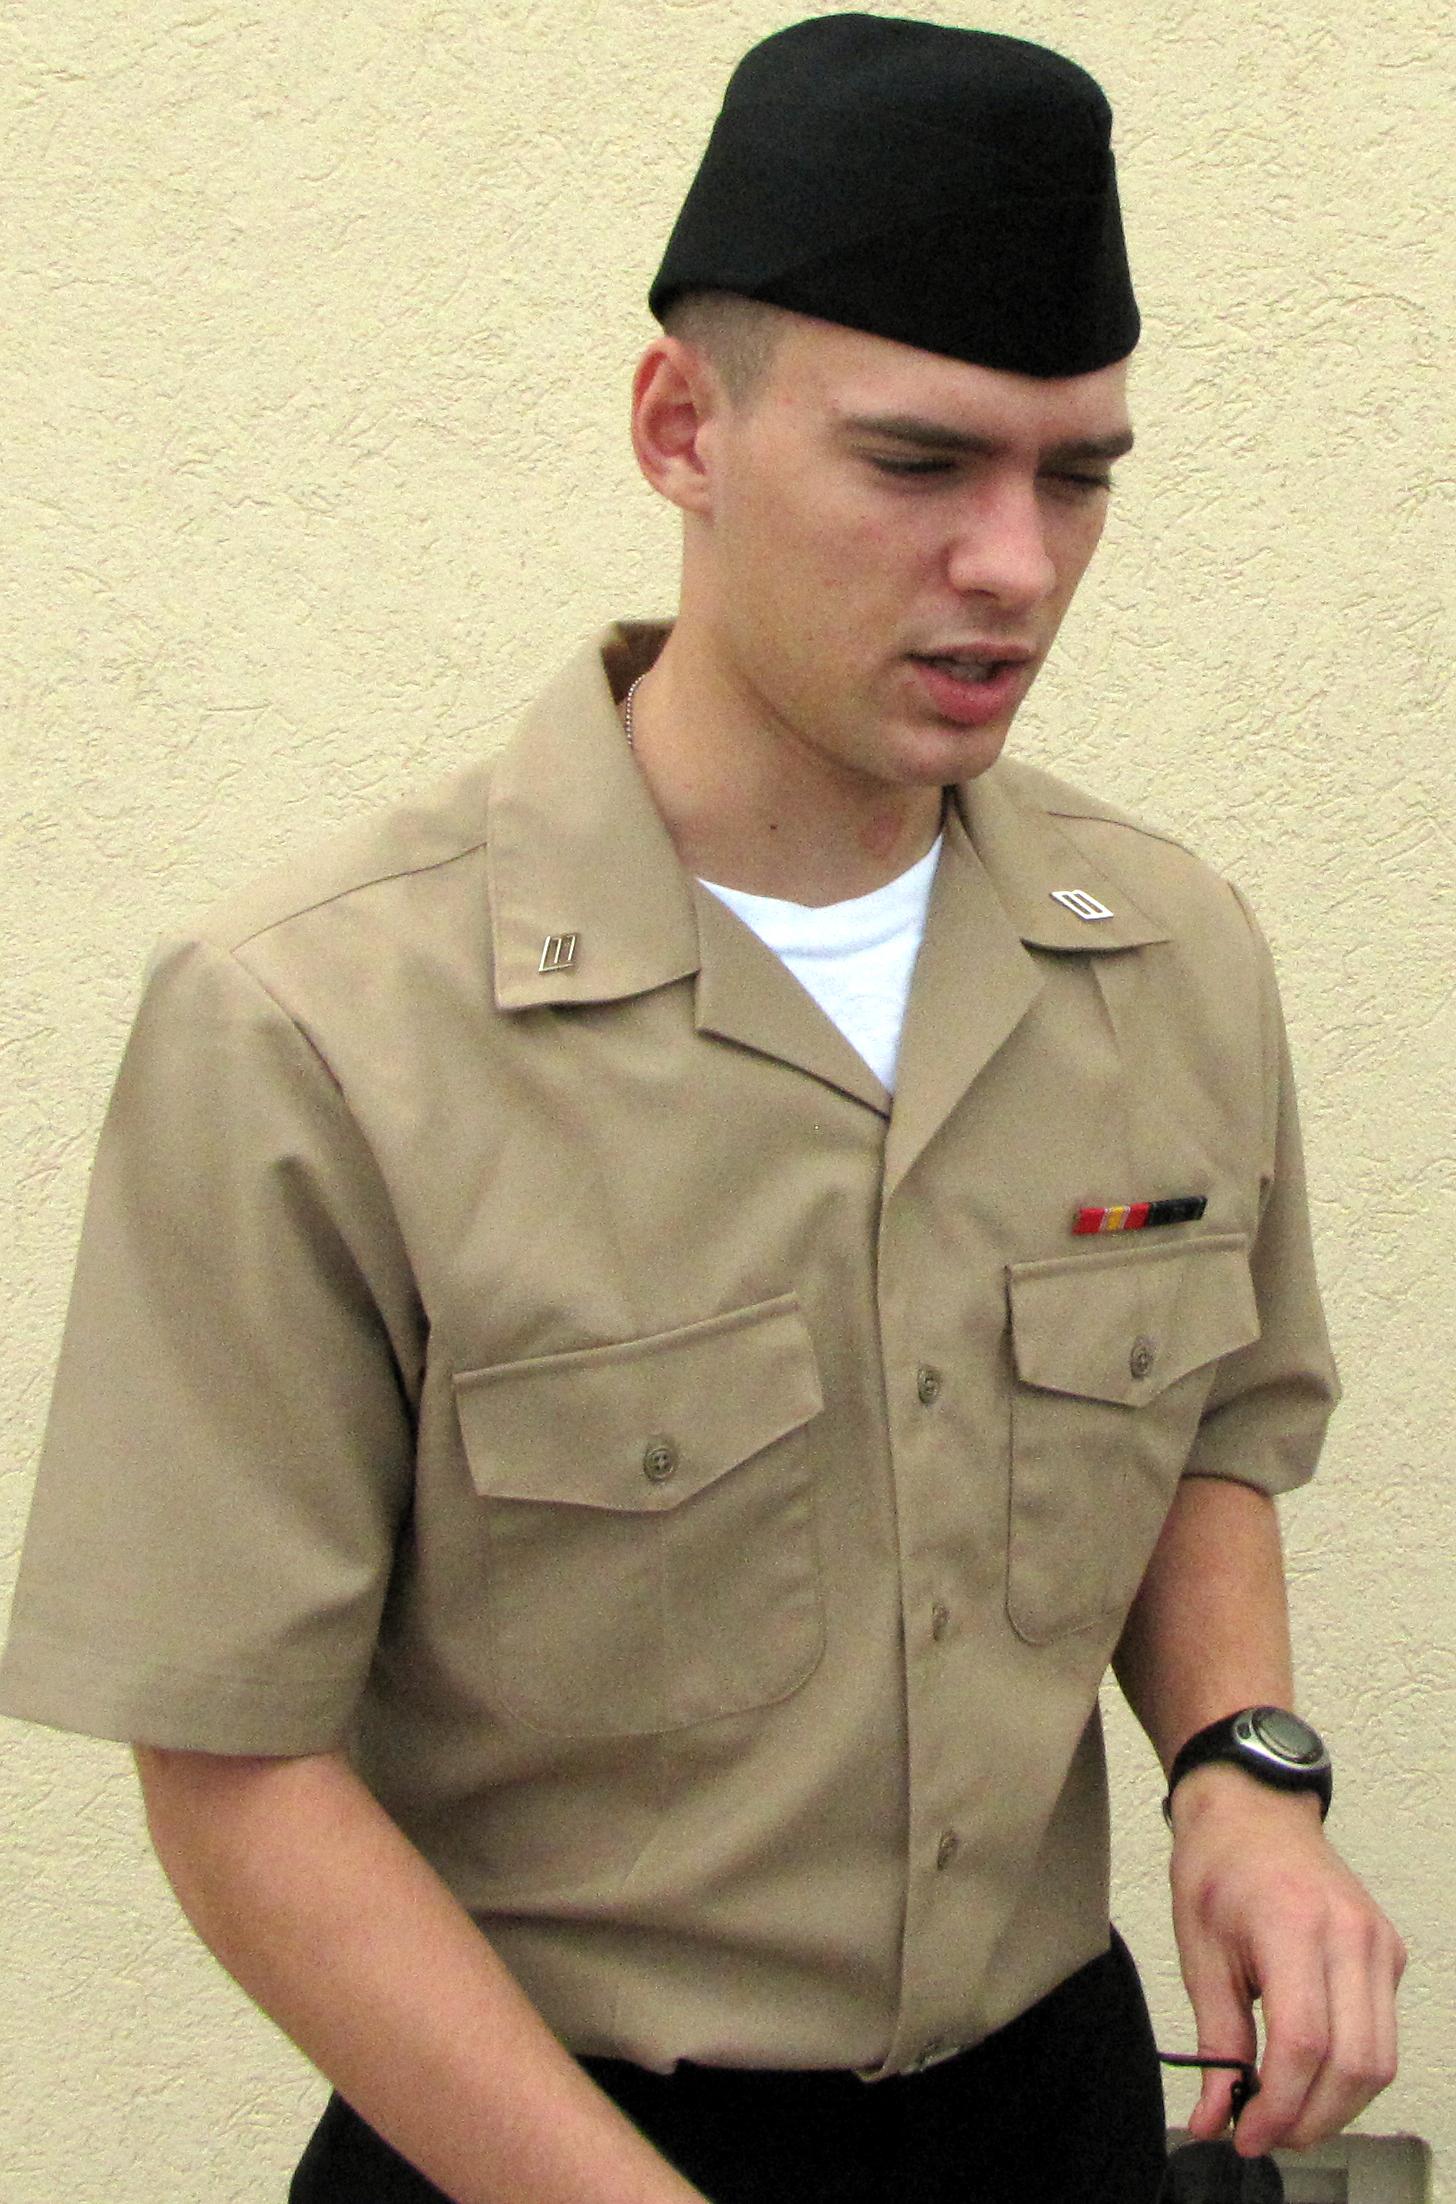 Photo: Service Uniform at PIR.